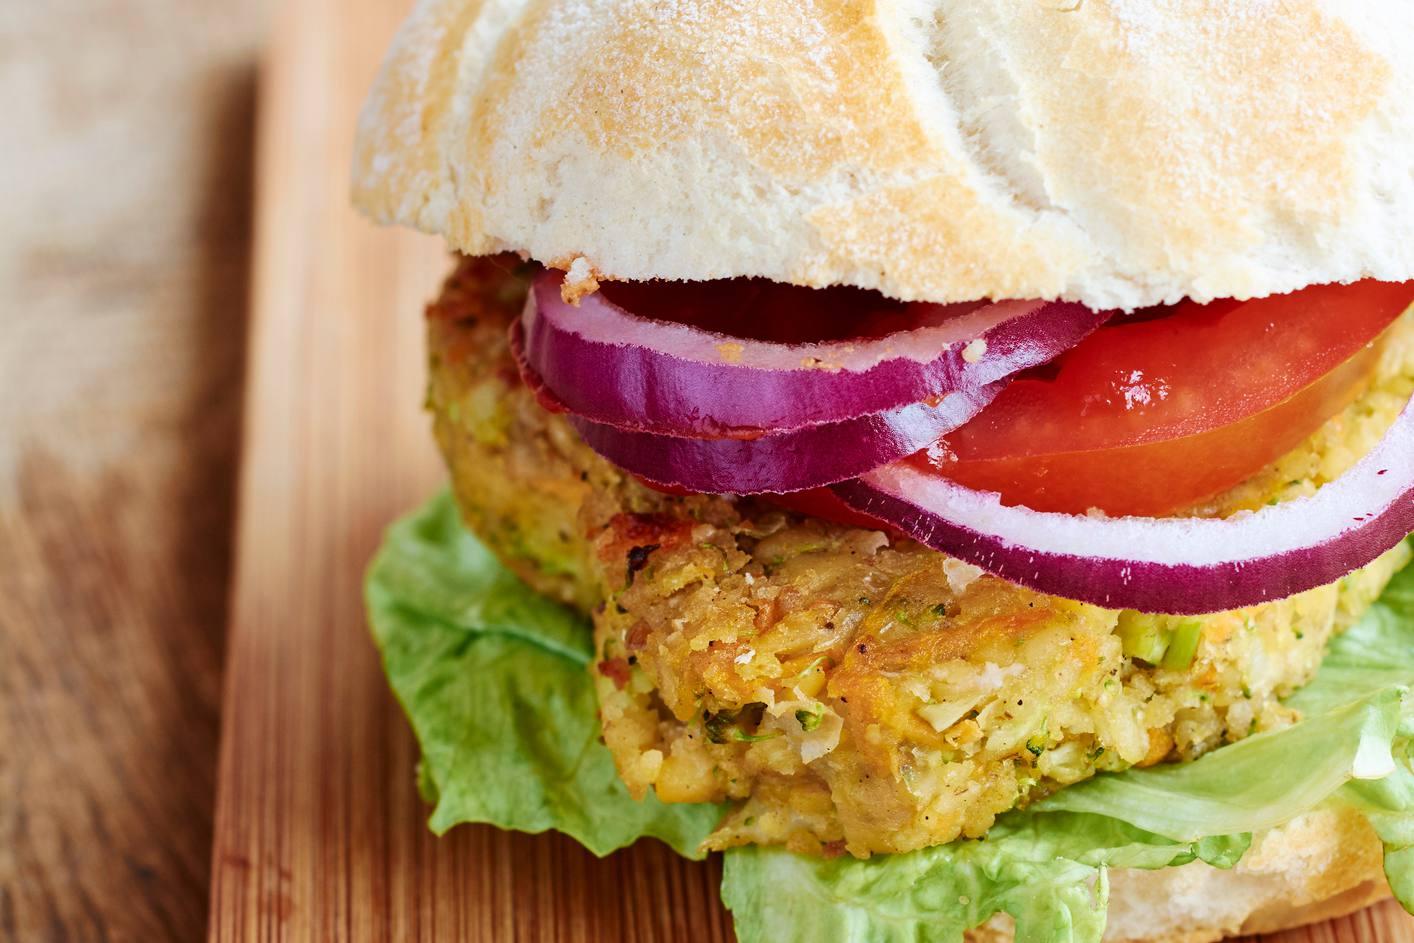 TVP burger